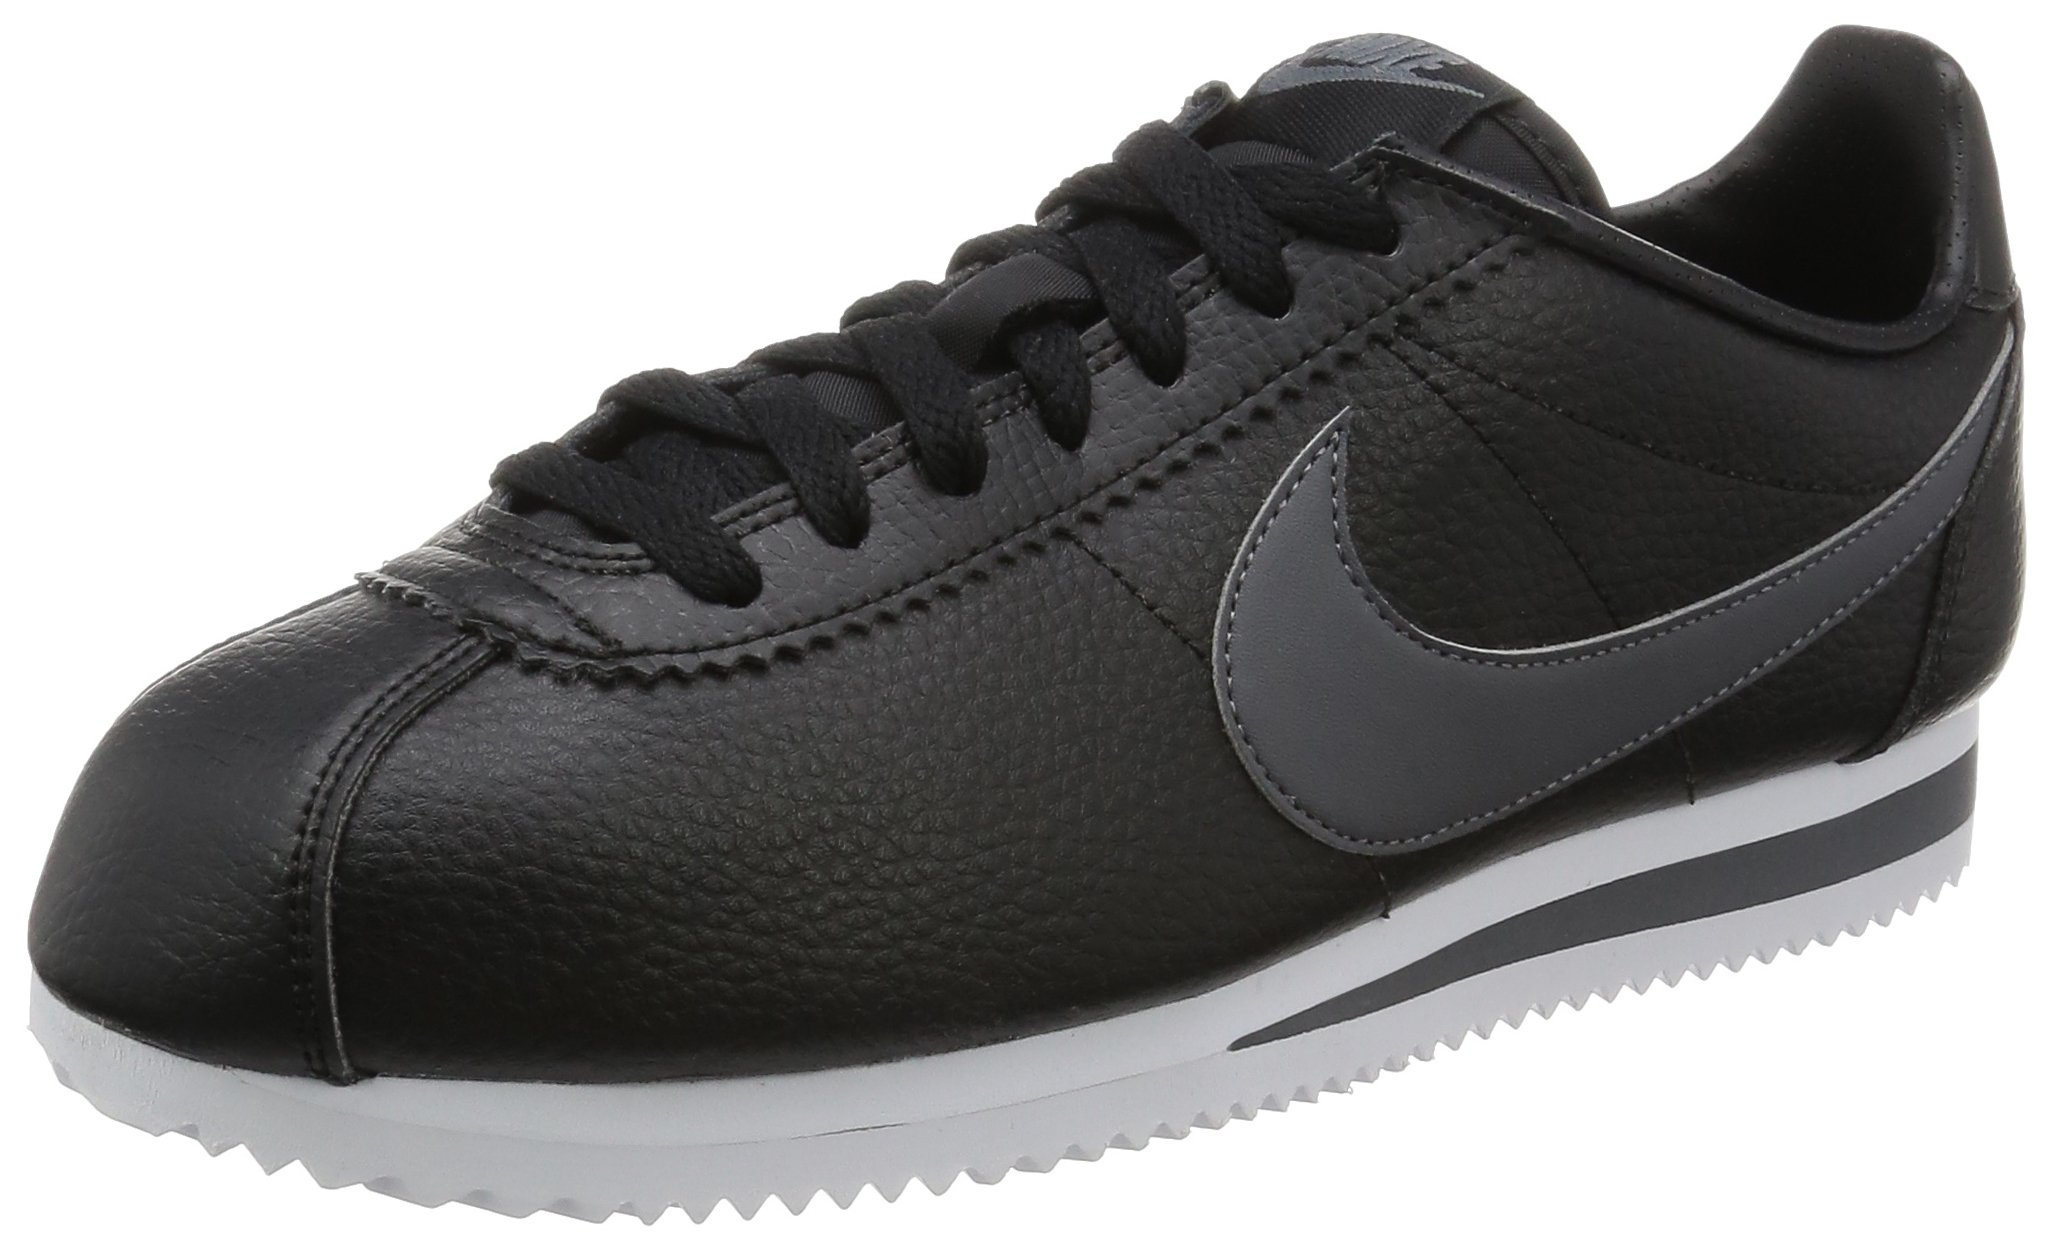 Nike Air Max 98 'Black Multicolor' bientôt disponible Sneakers Magasin Pas Cher Homme | Femme